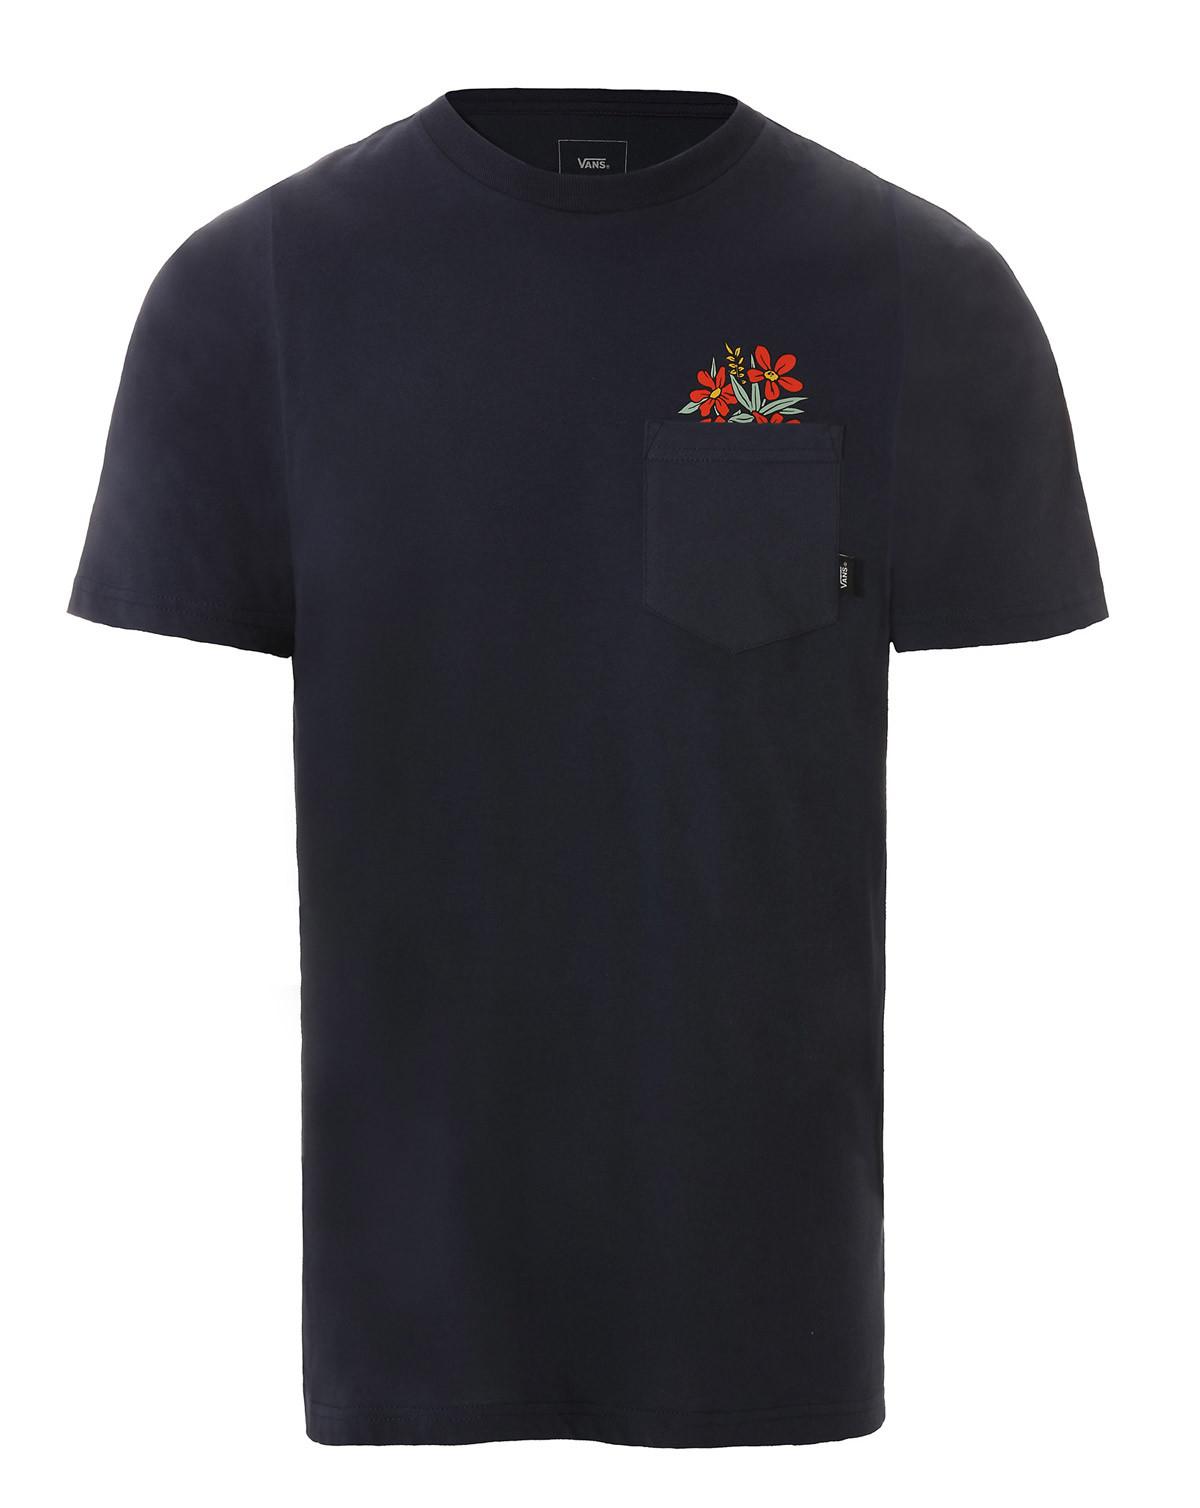 VANS Death Pocket T-shirt (Navy, M)